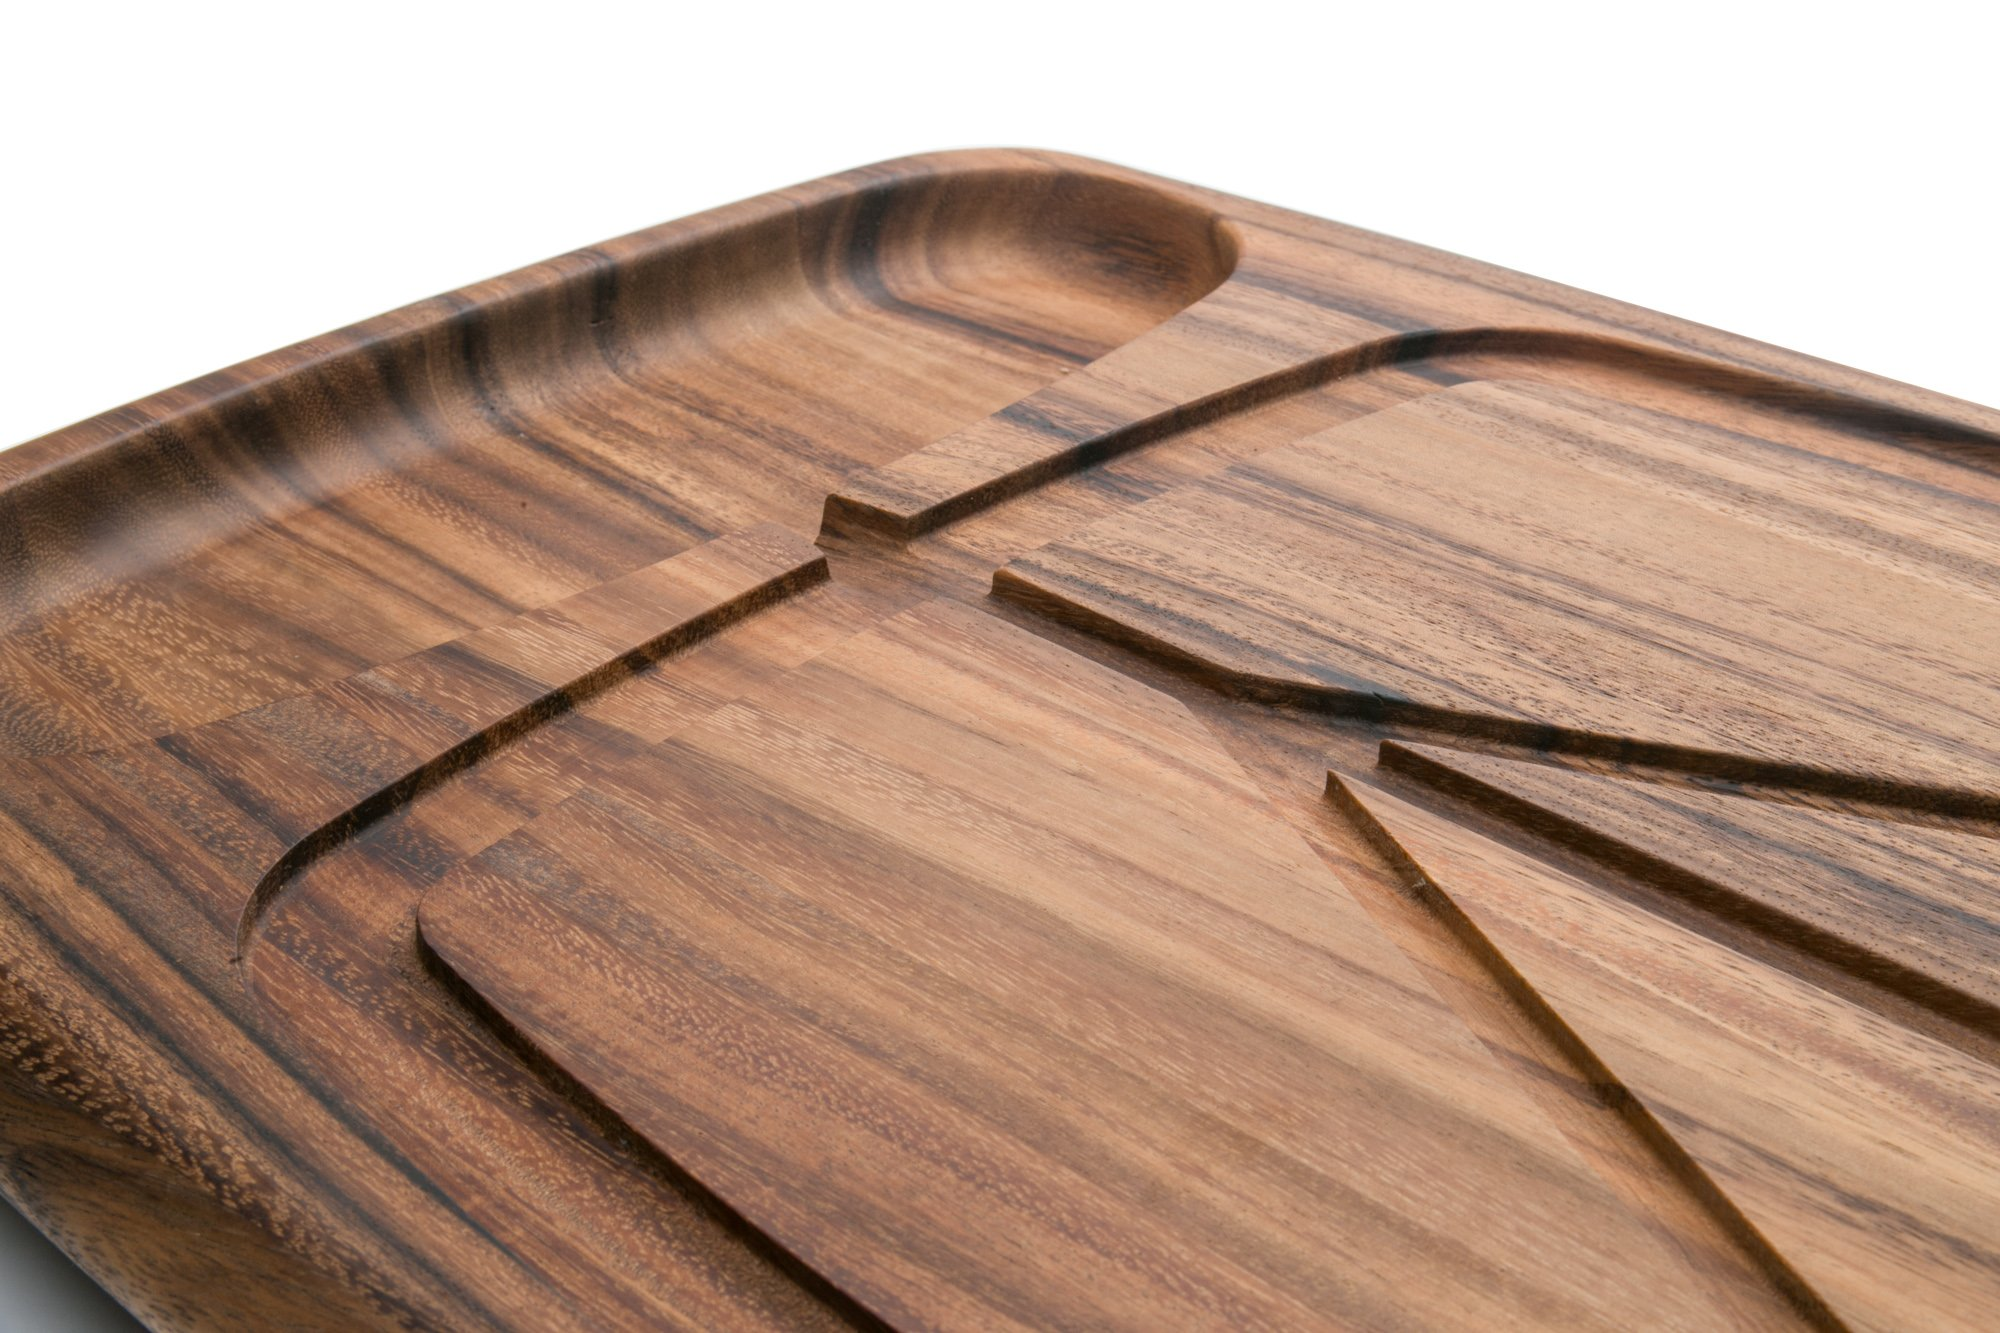 Ironwood Gourmet 28103 Kansas City Carving Board 22'' x 15'' x 1.5'' by Ironwood Gourmet (Image #4)